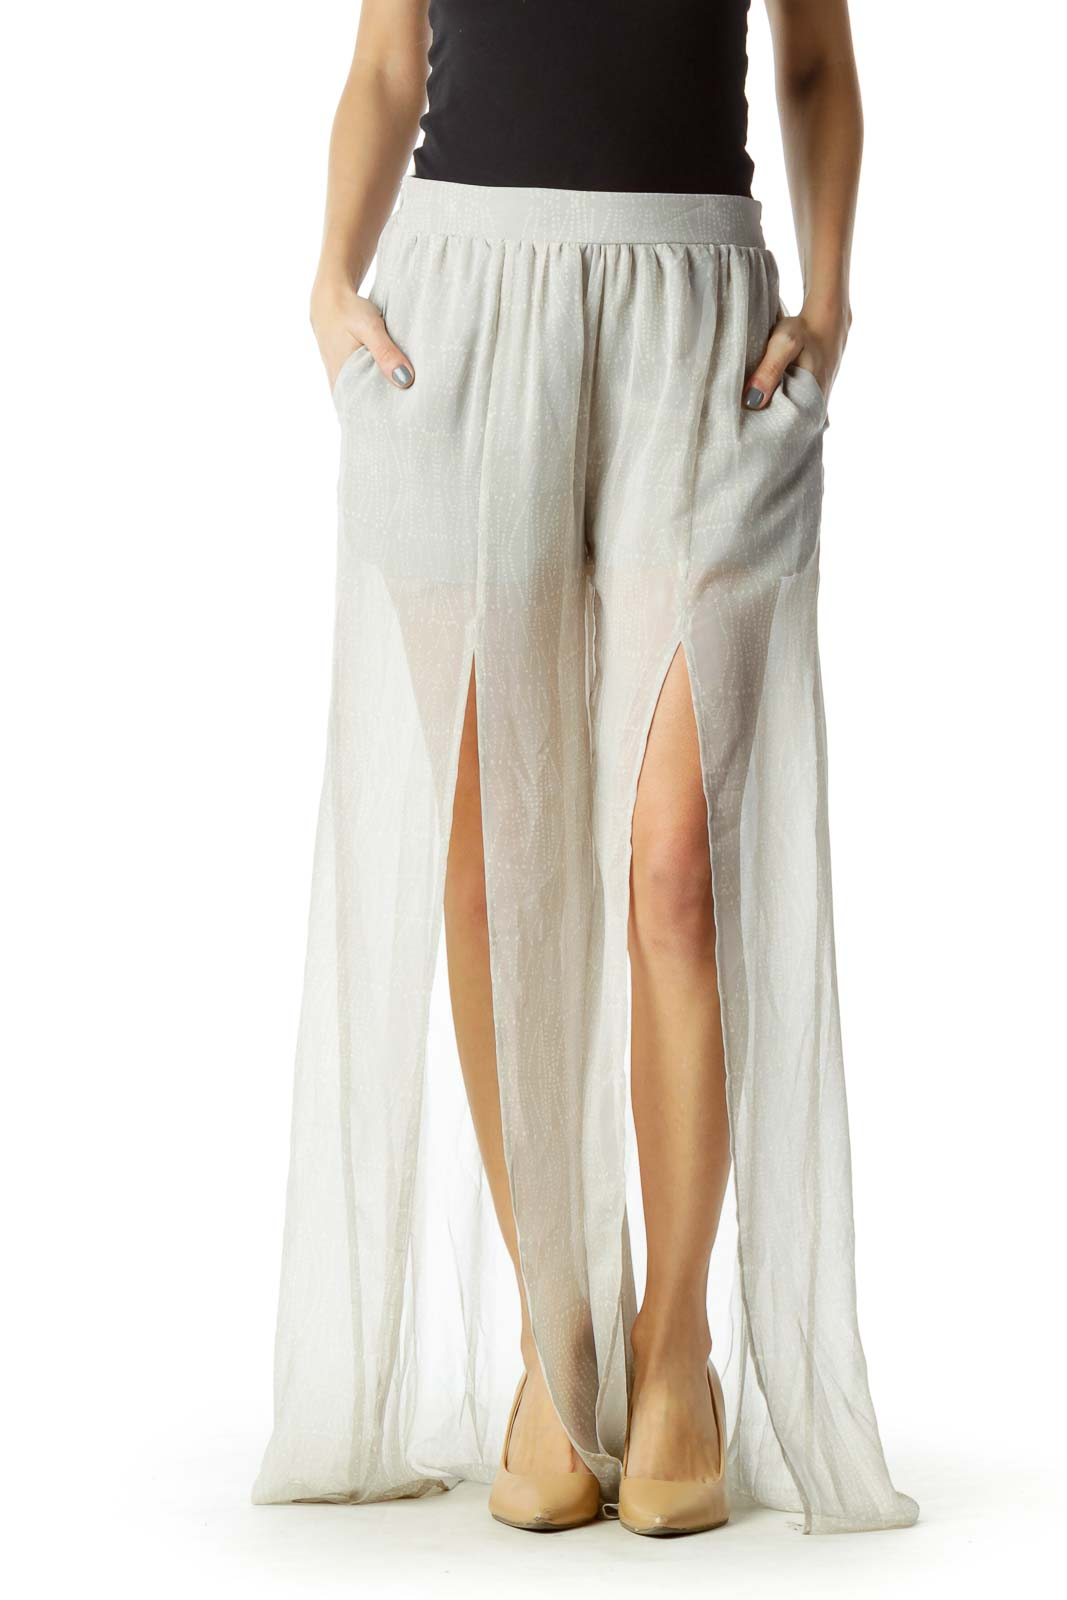 Gray Tonal Print Maxi Skirt with Shorts